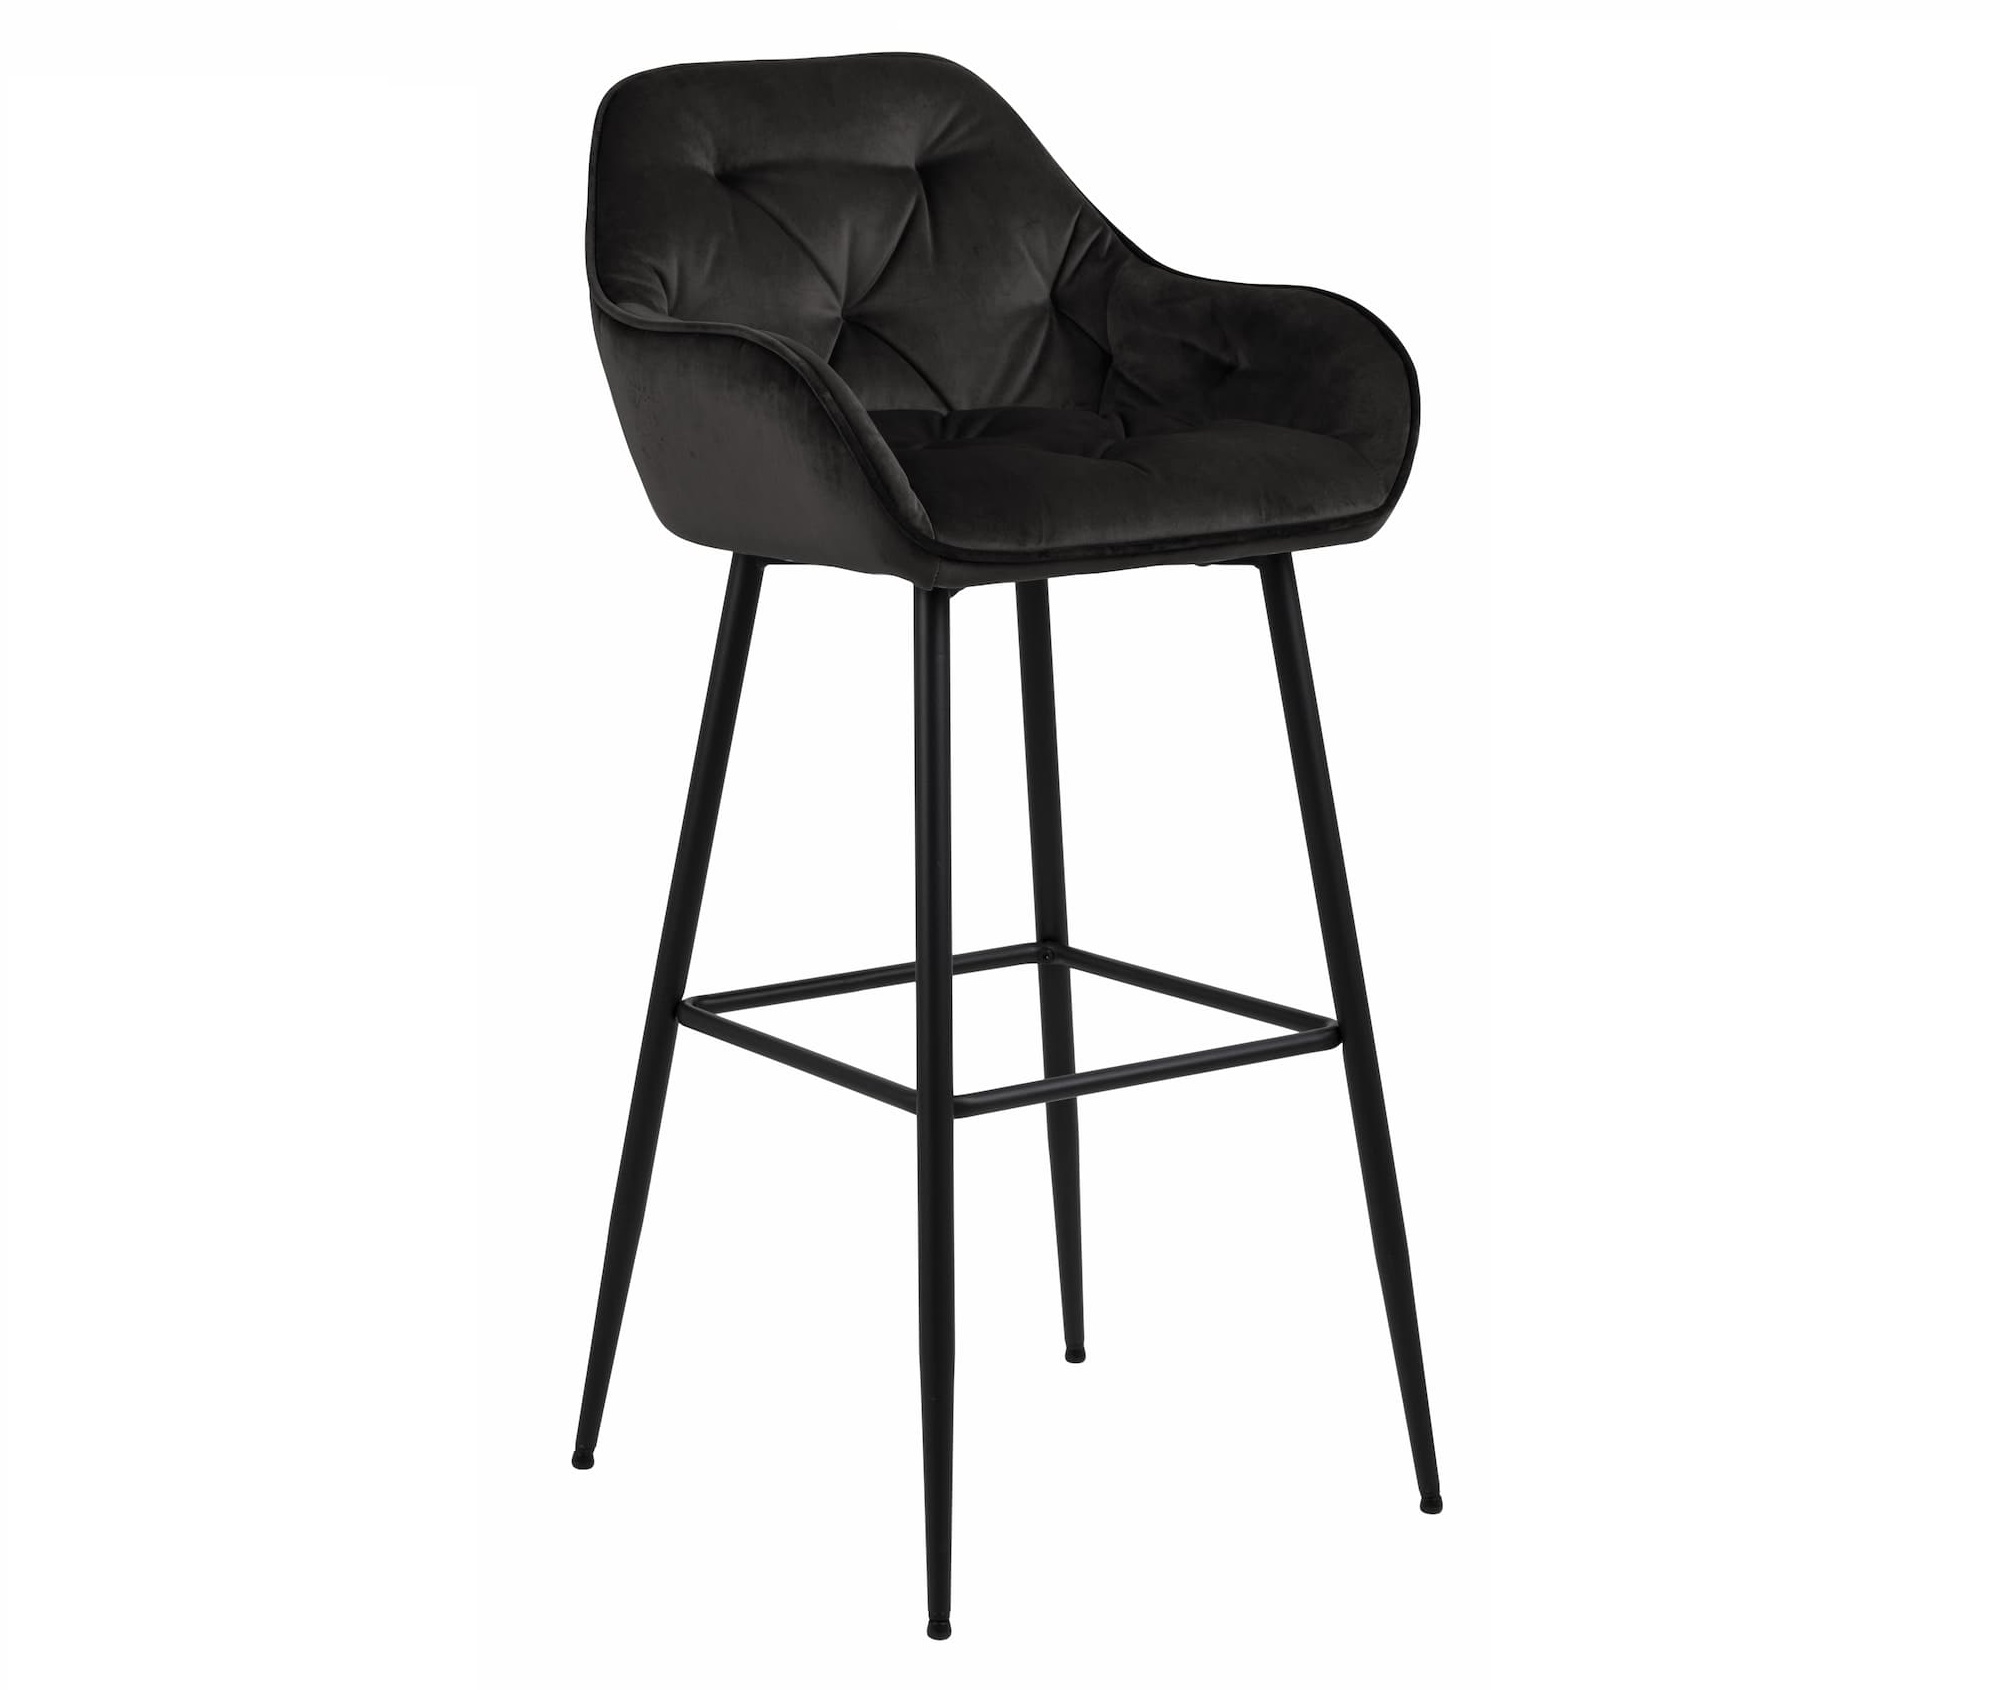 Scaun de bar tapitat cu stofa si picioare metalice Brooke Velvet Grafit / Negru, l55xA52xH103,5 cm vivre.ro